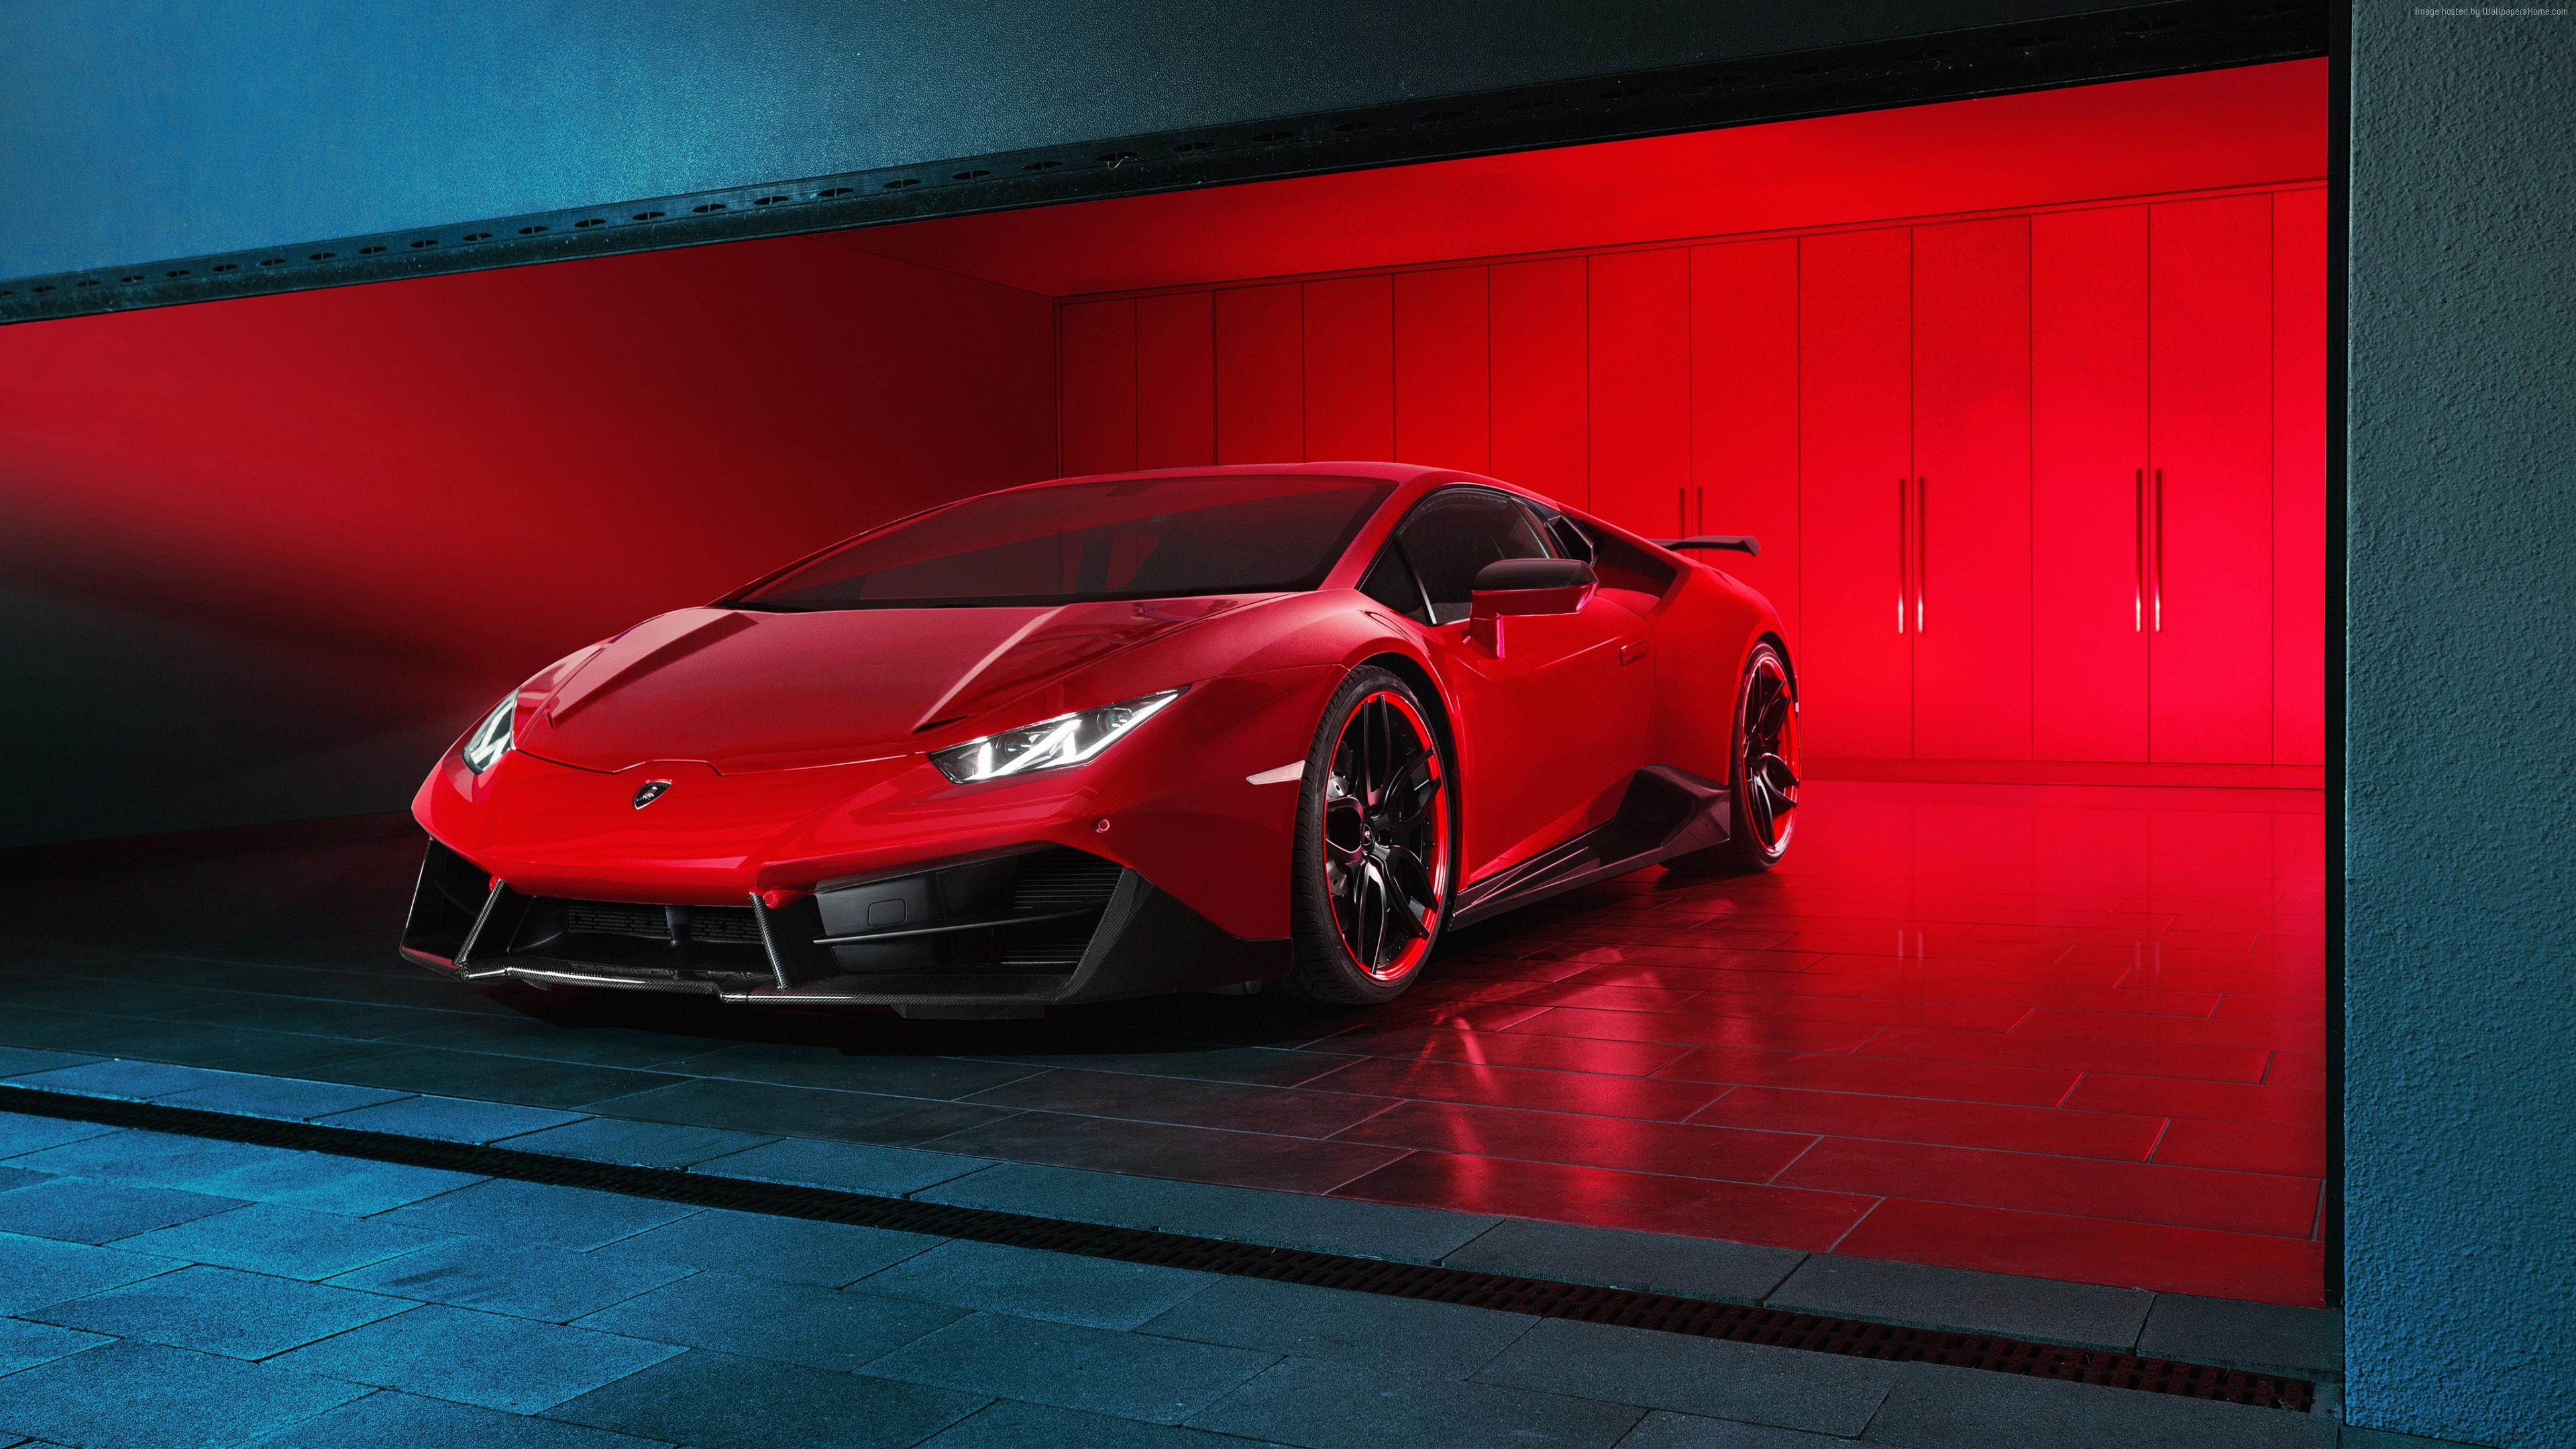 novitec torado lamborghini huracan 1539104836 - Novitec Torado Lamborghini Huracan - red wallpapers, lamborghini wallpapers, lamborghini huracan wallpapers, cars wallpapers, 4k-wallpapers, 2016 cars wallpapers